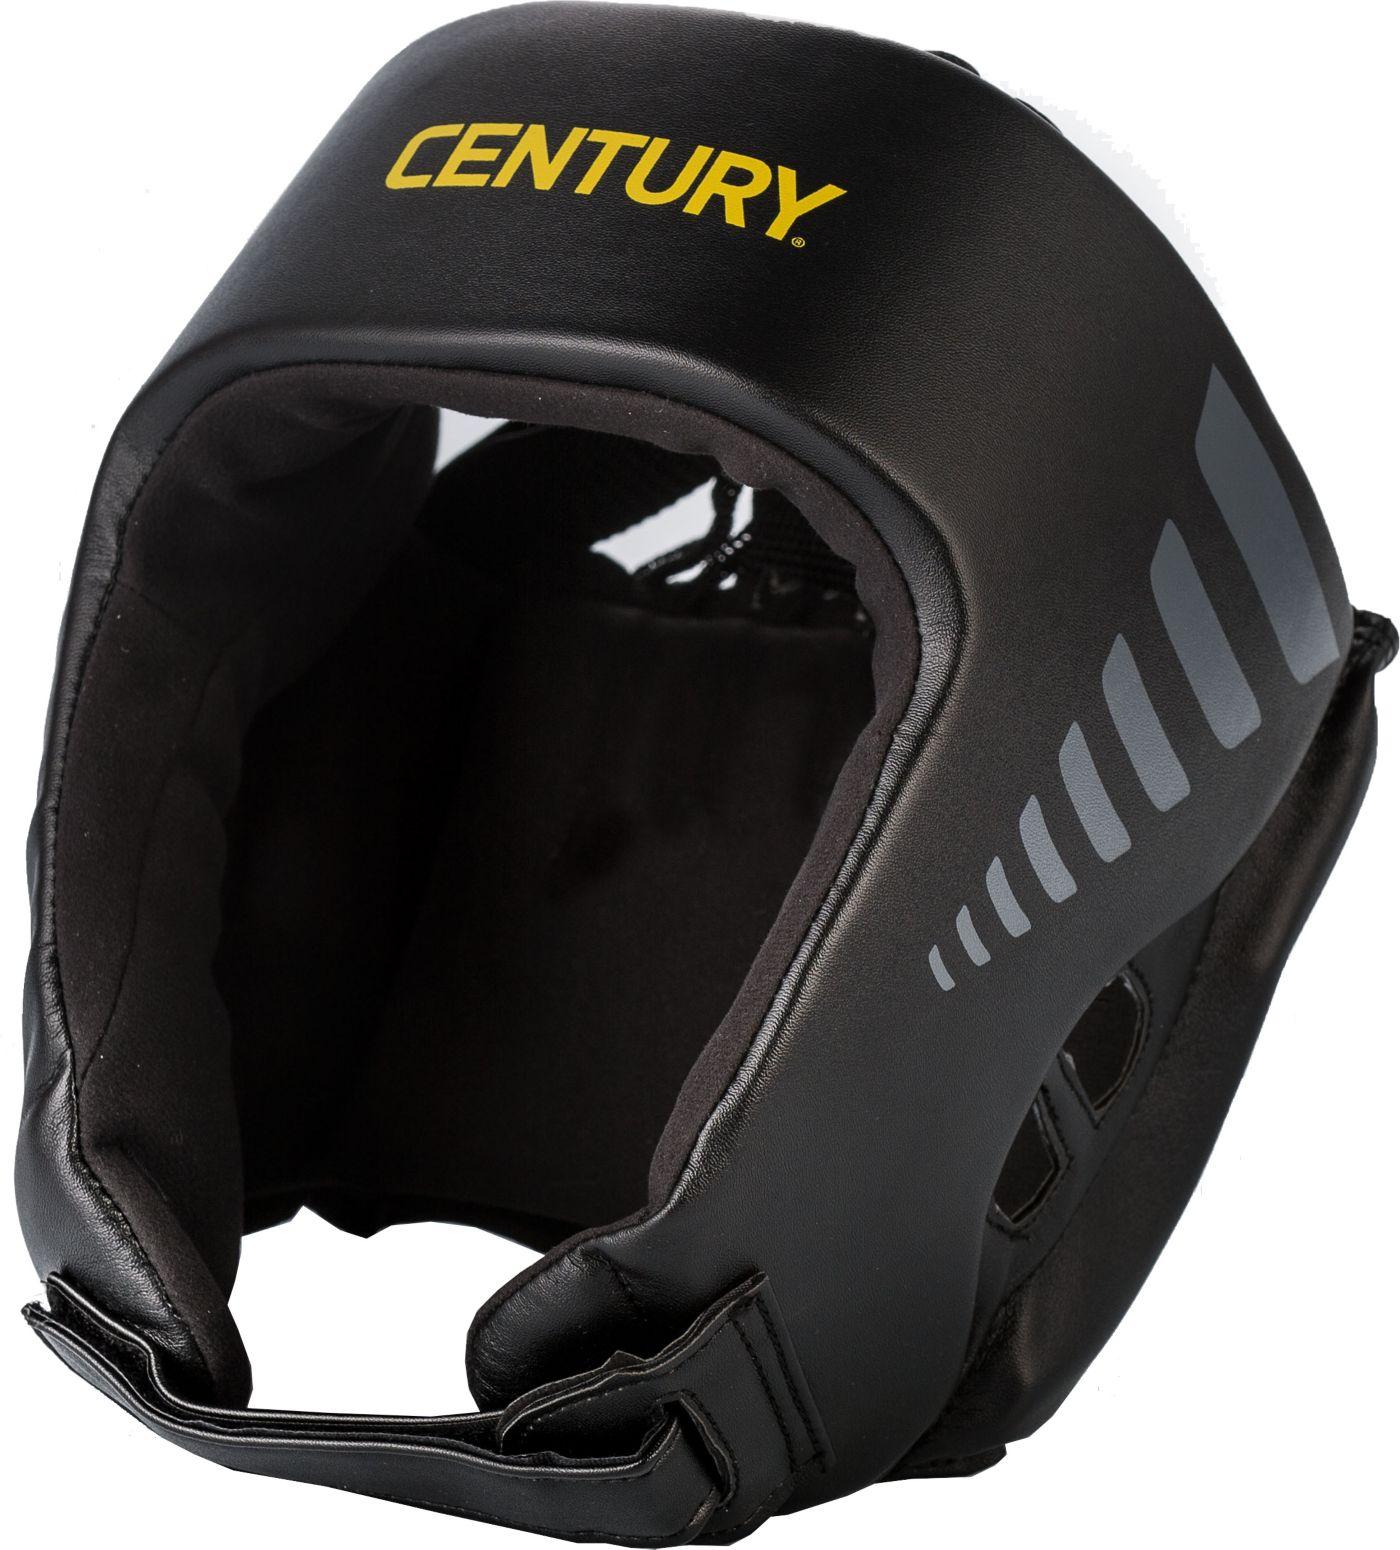 Century BRAVE Open Face Headgear